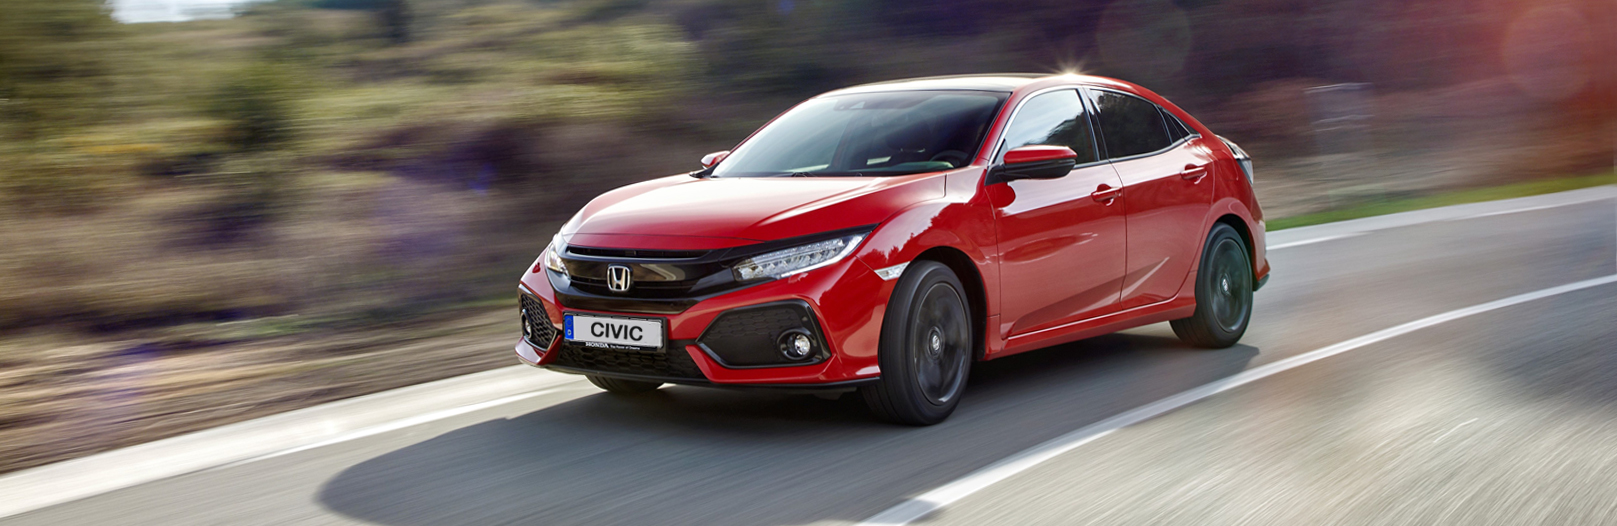 Honda Civic Turbo Plus Wochen | Autohaus Braun Lampertheim-Hüttenfeld